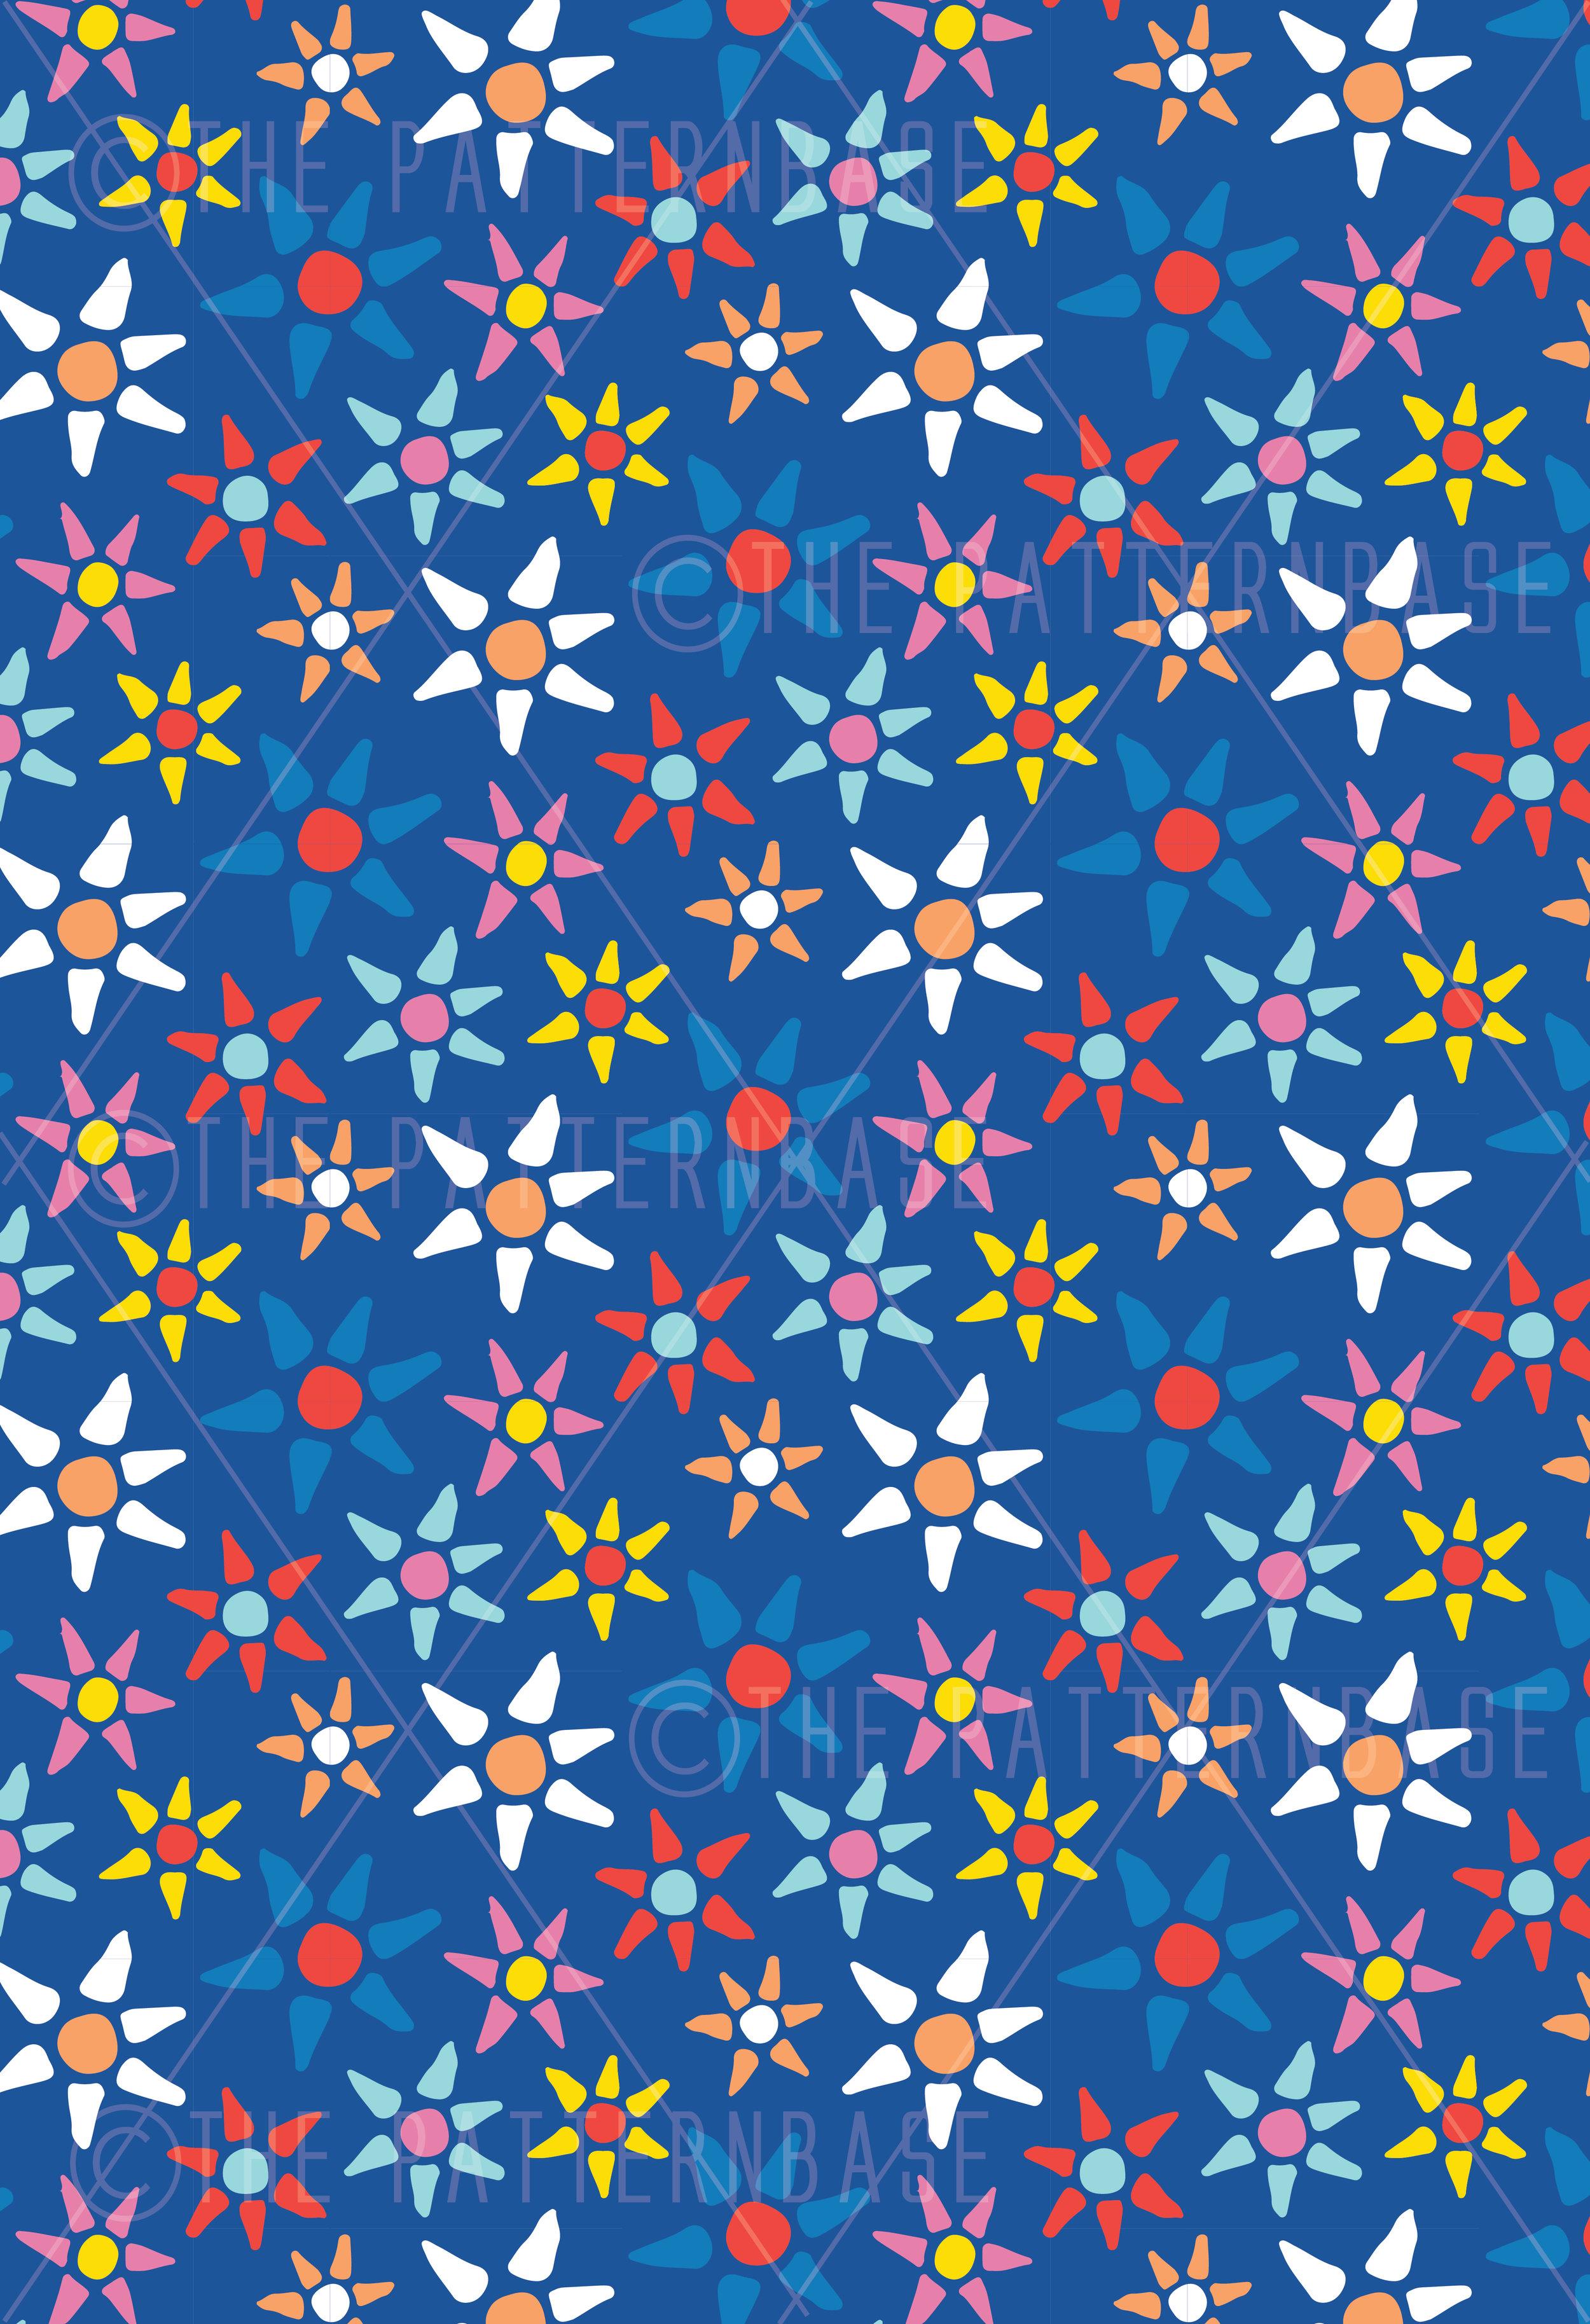 patternbase-alea-wm.jpg